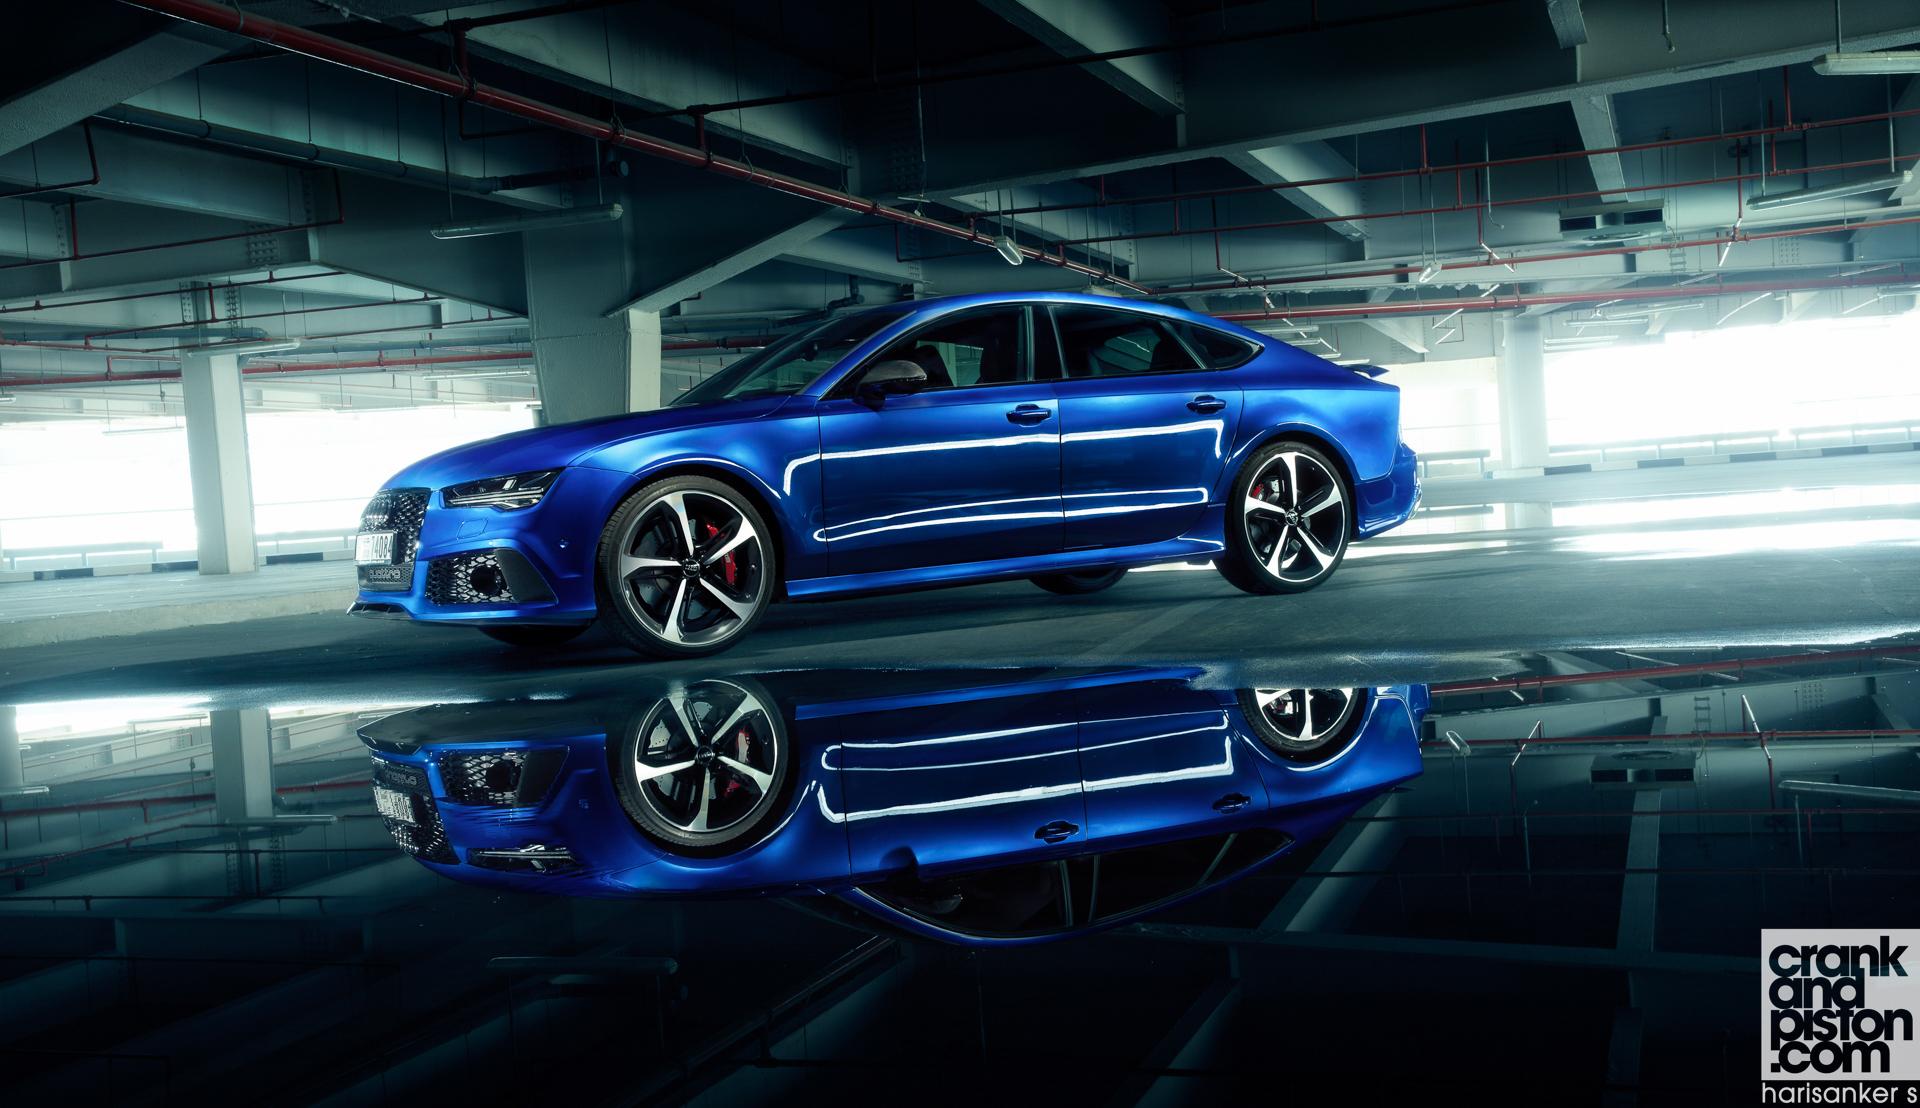 Audi RS7 crankandpiston Wallpapers-1